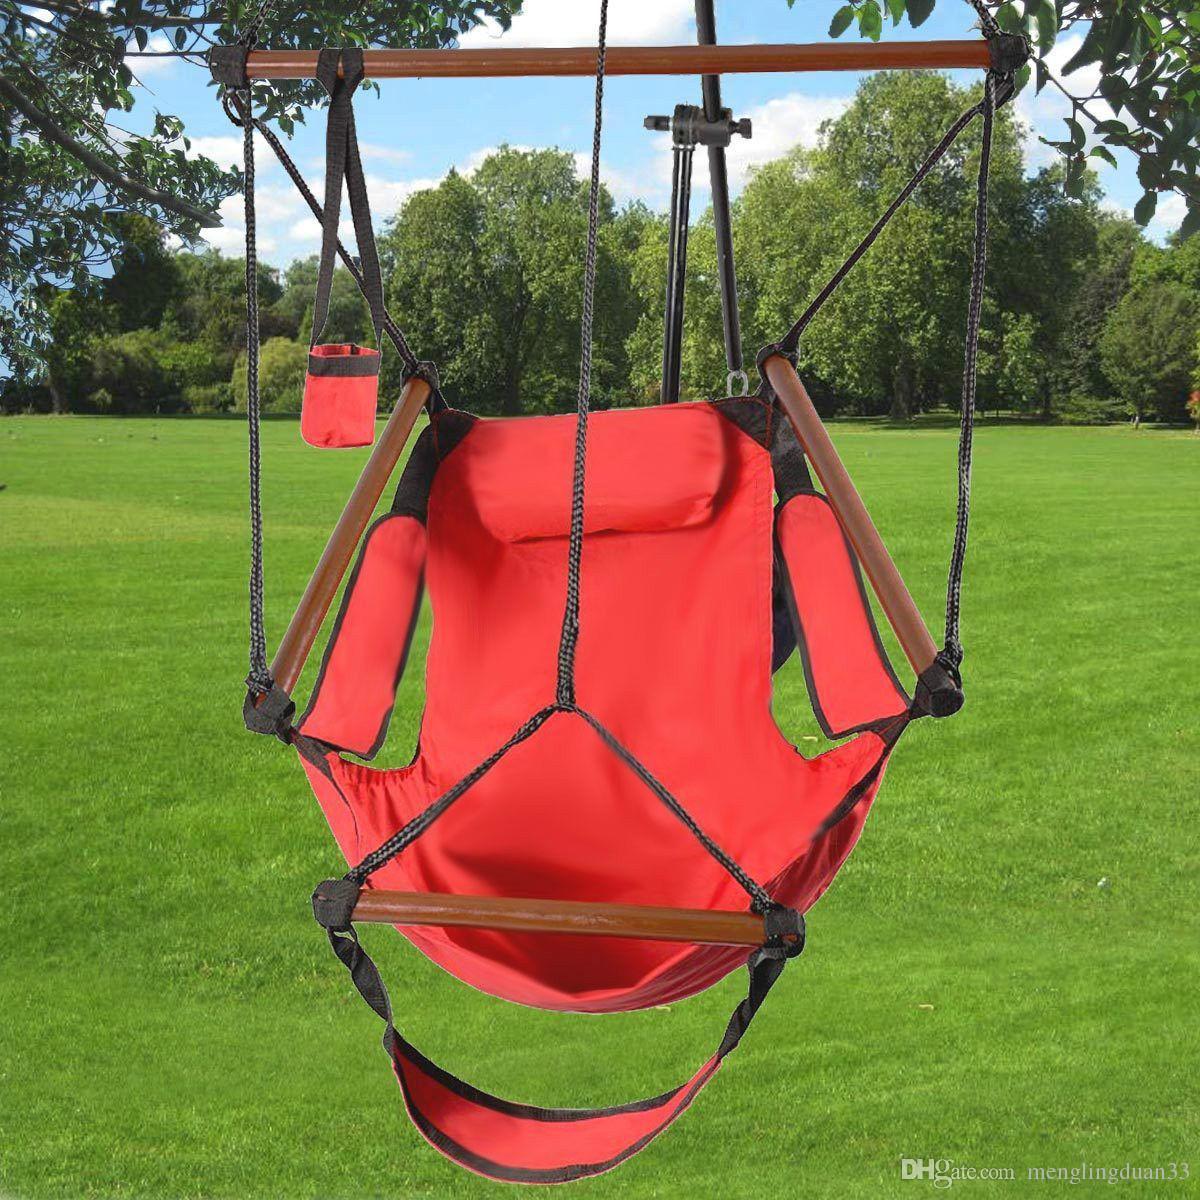 indoor hammock chair royal princess 2017 outdoor hanging air deluxe swing